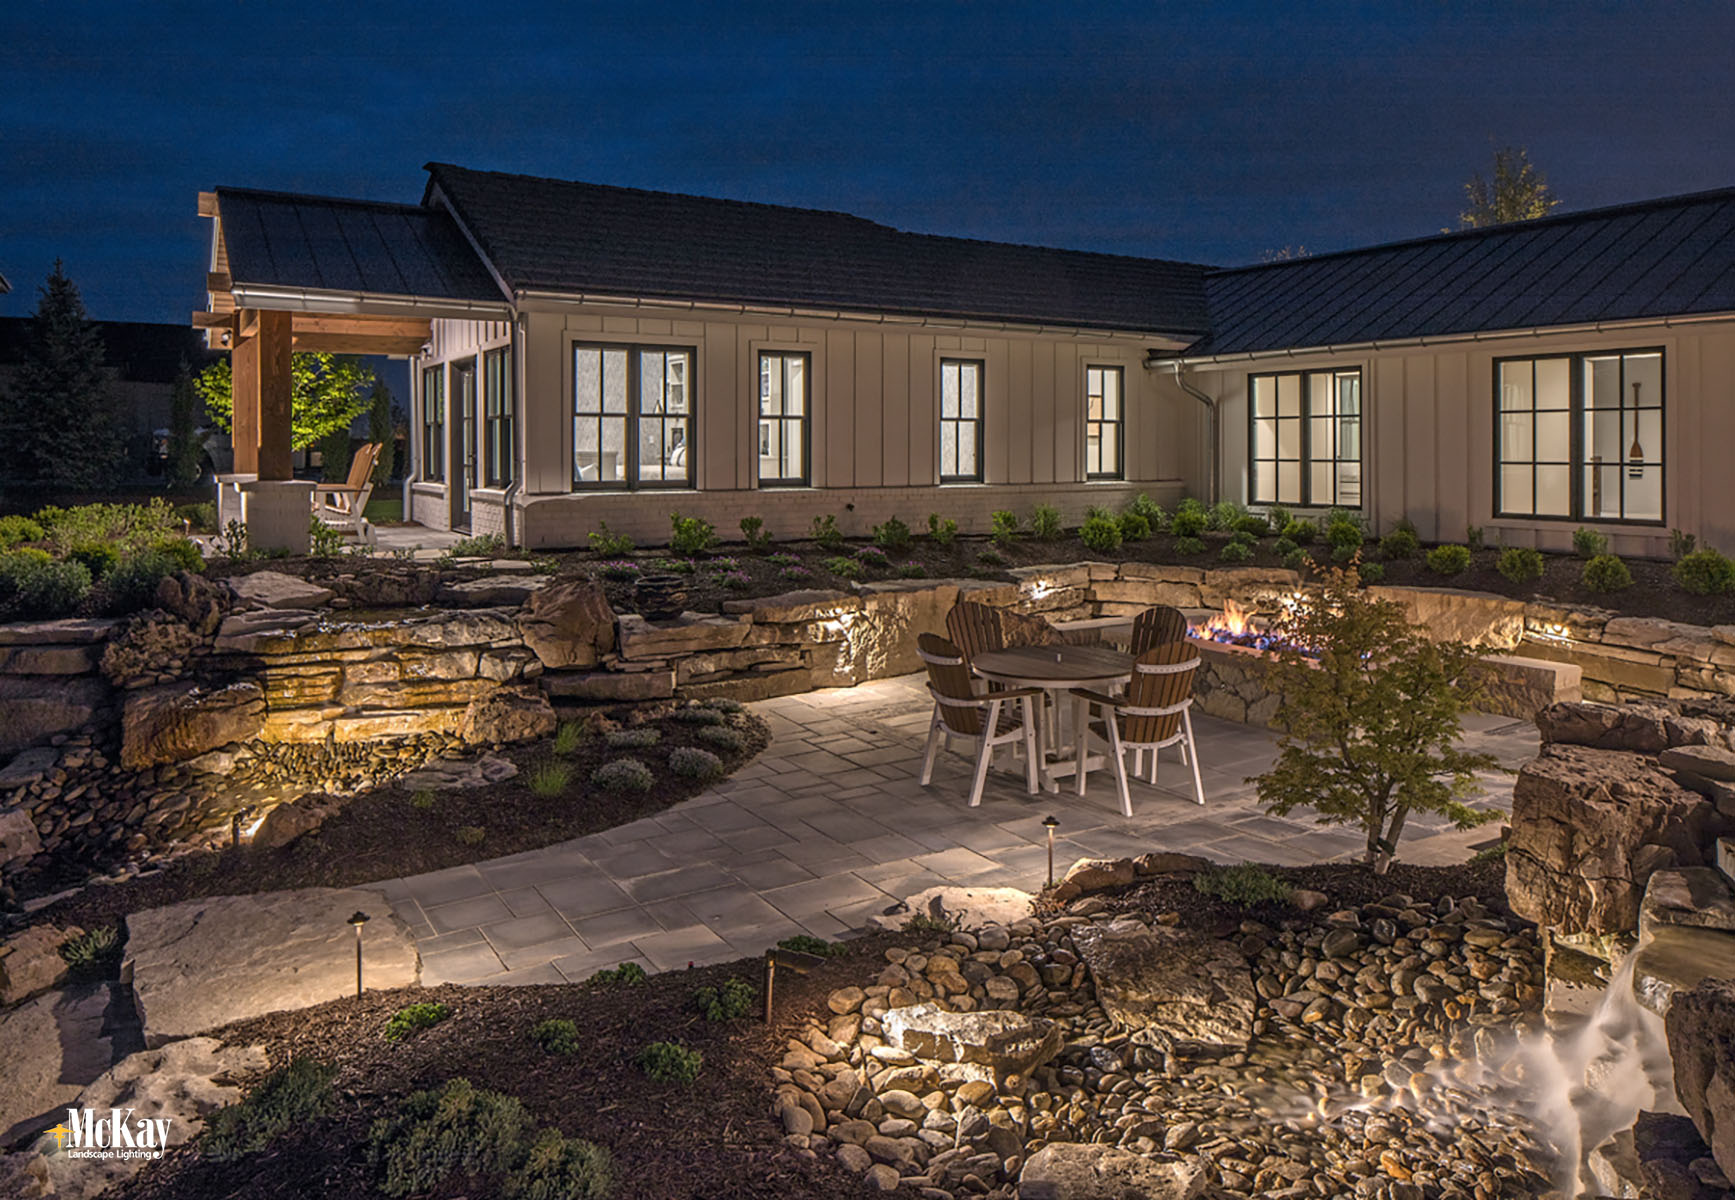 Lake House Outdoor Patio Lighting Design Ideas Bluewater Lake Valley Nebraska McKay Landscape Lighting